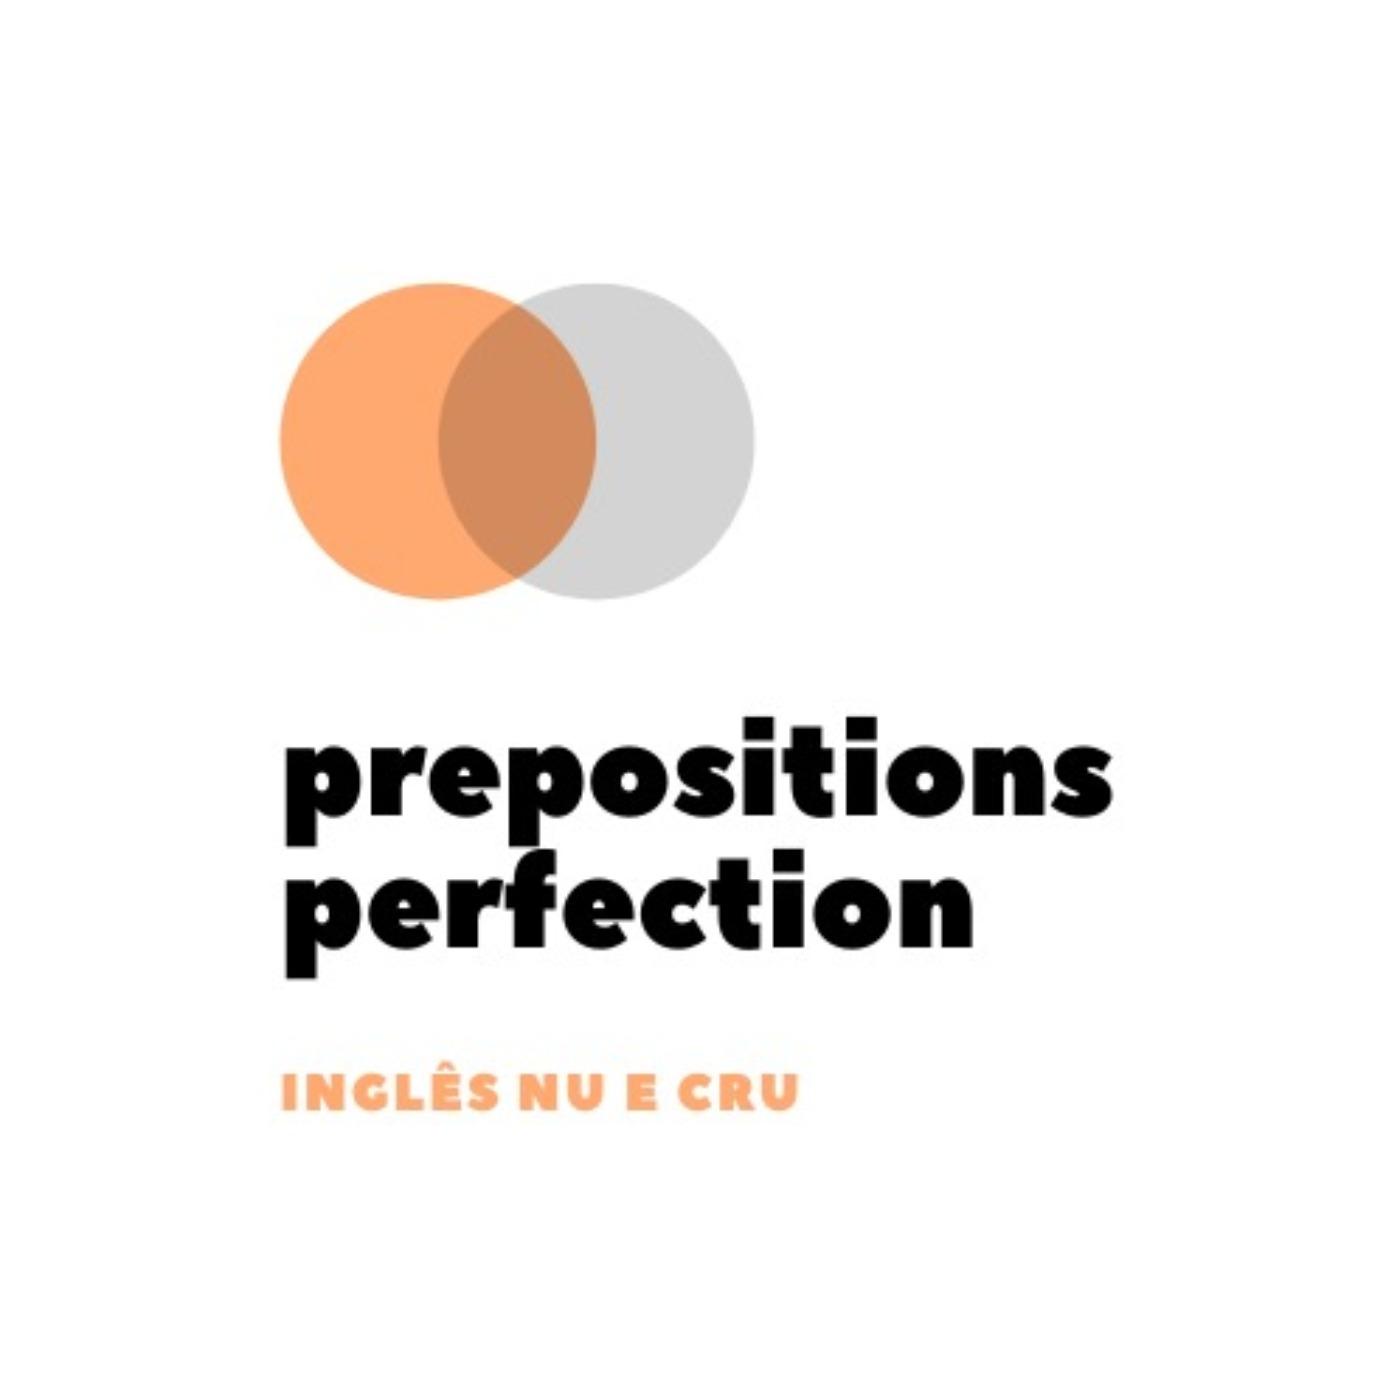 548 - Prepositions Perfection Challenge do Inglês Nu E Cru!